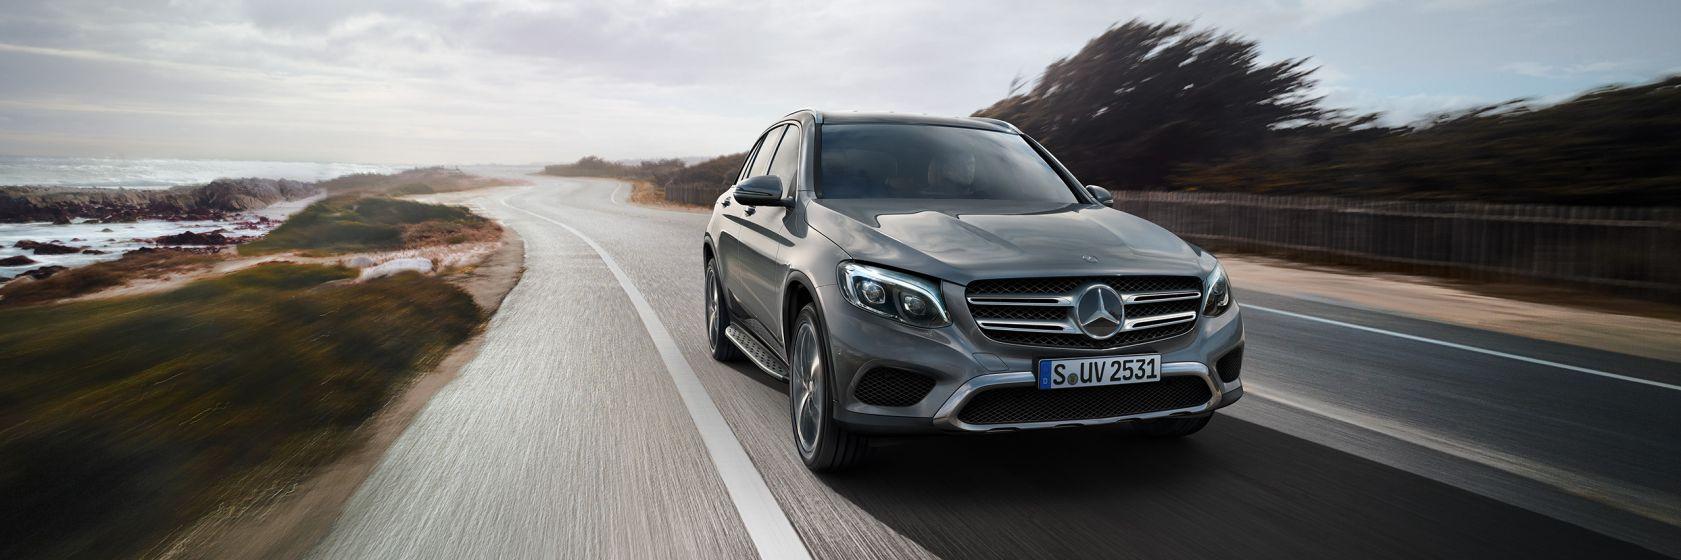 Mercedes glc plateado